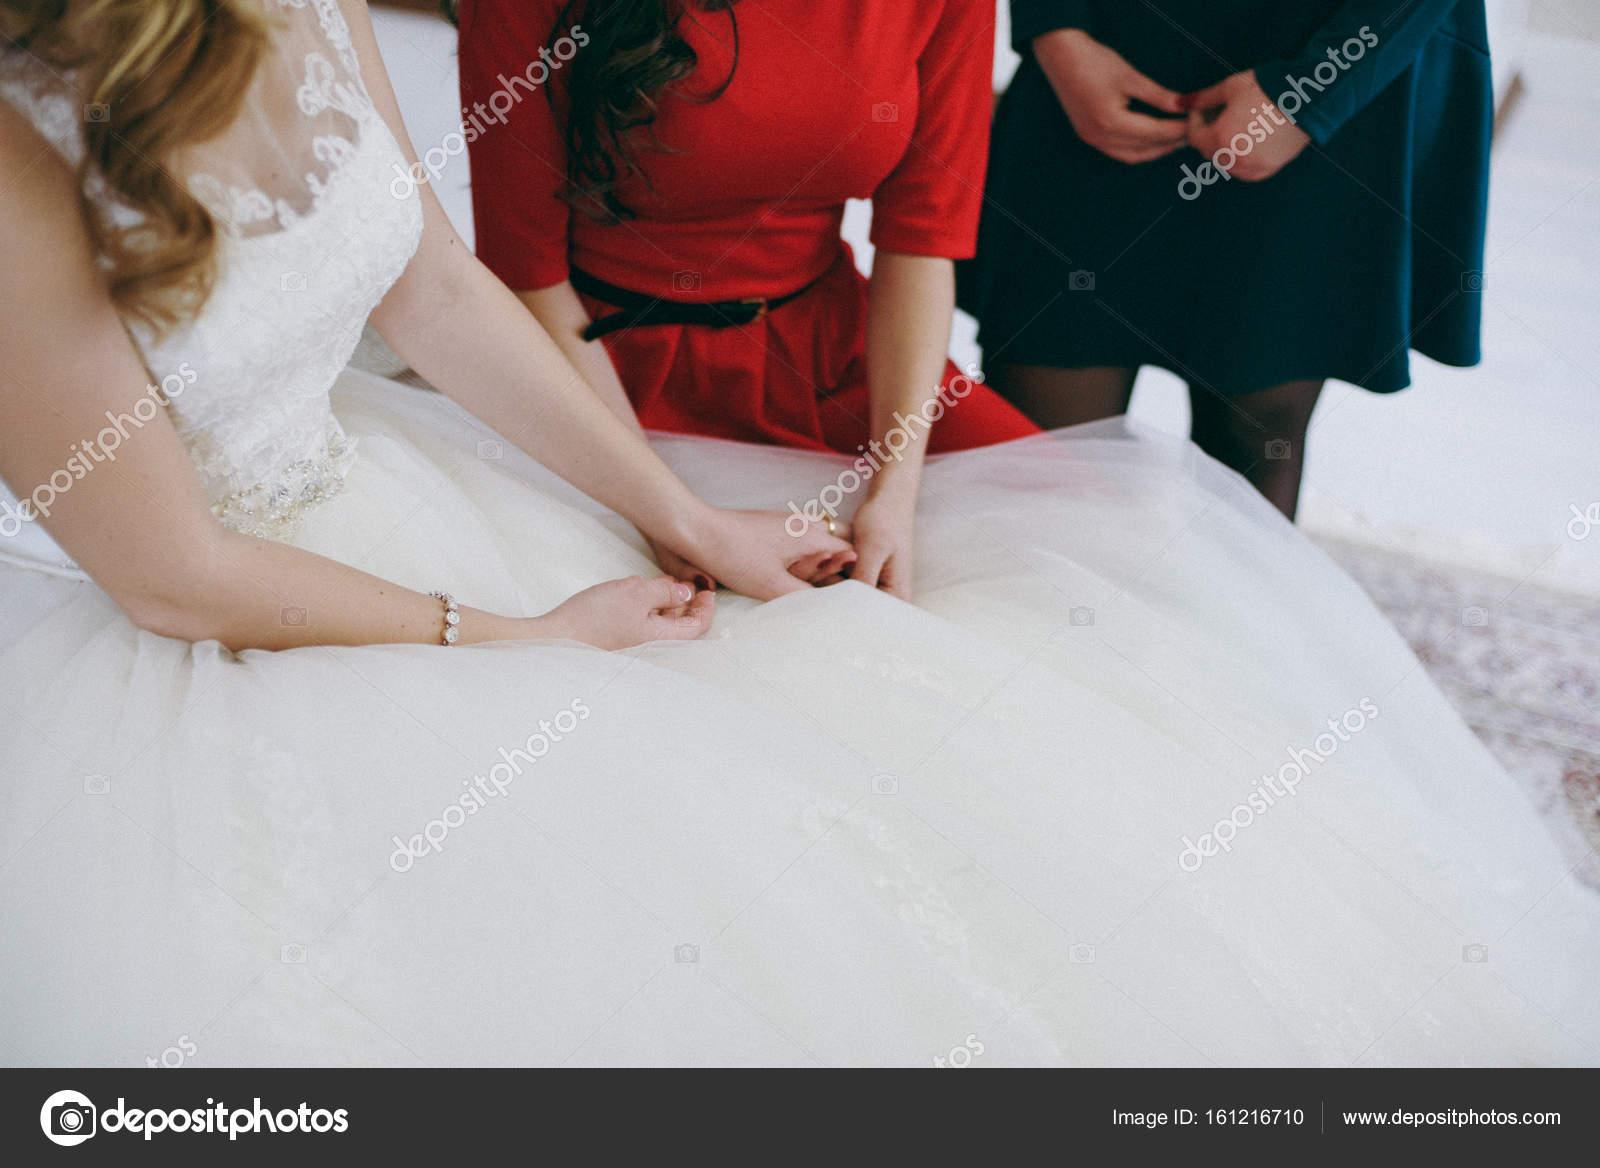 Freundin Steckt Den Ring Am Finger Der Braut Das Madchen Zeigt